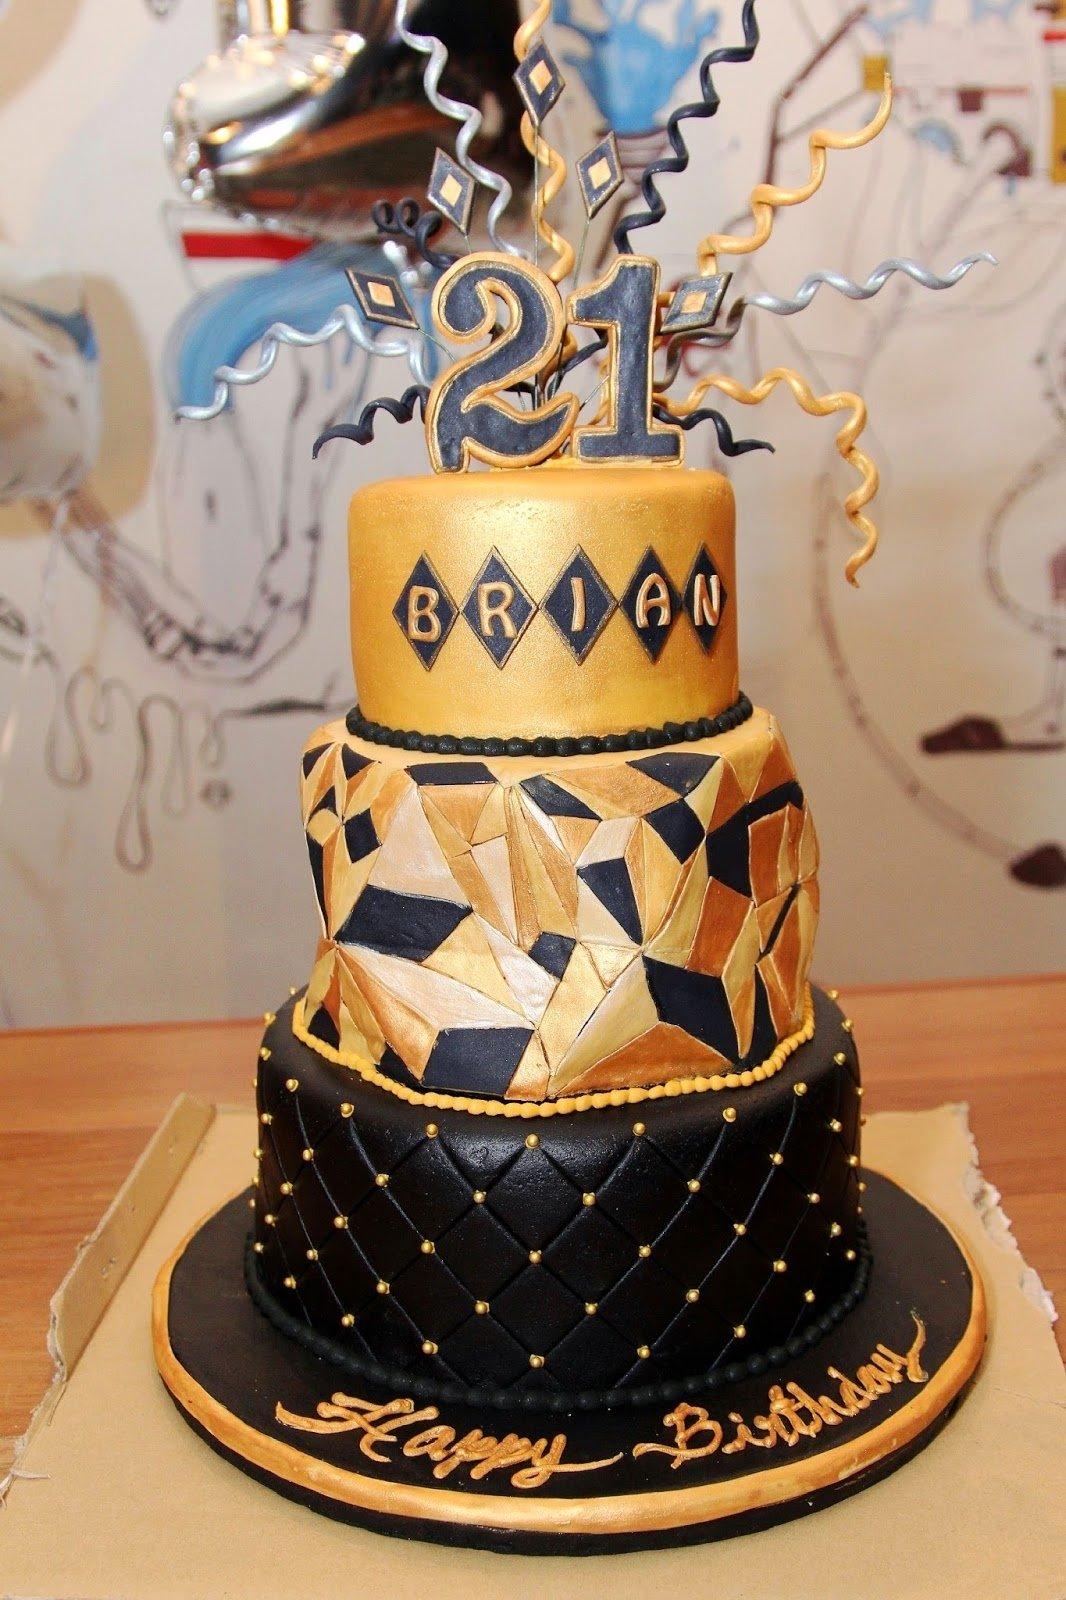 10 Fantastic 21St Birthday Ideas For Guys mr brian see mr brian sees 21st birthday party the curious goat 2021